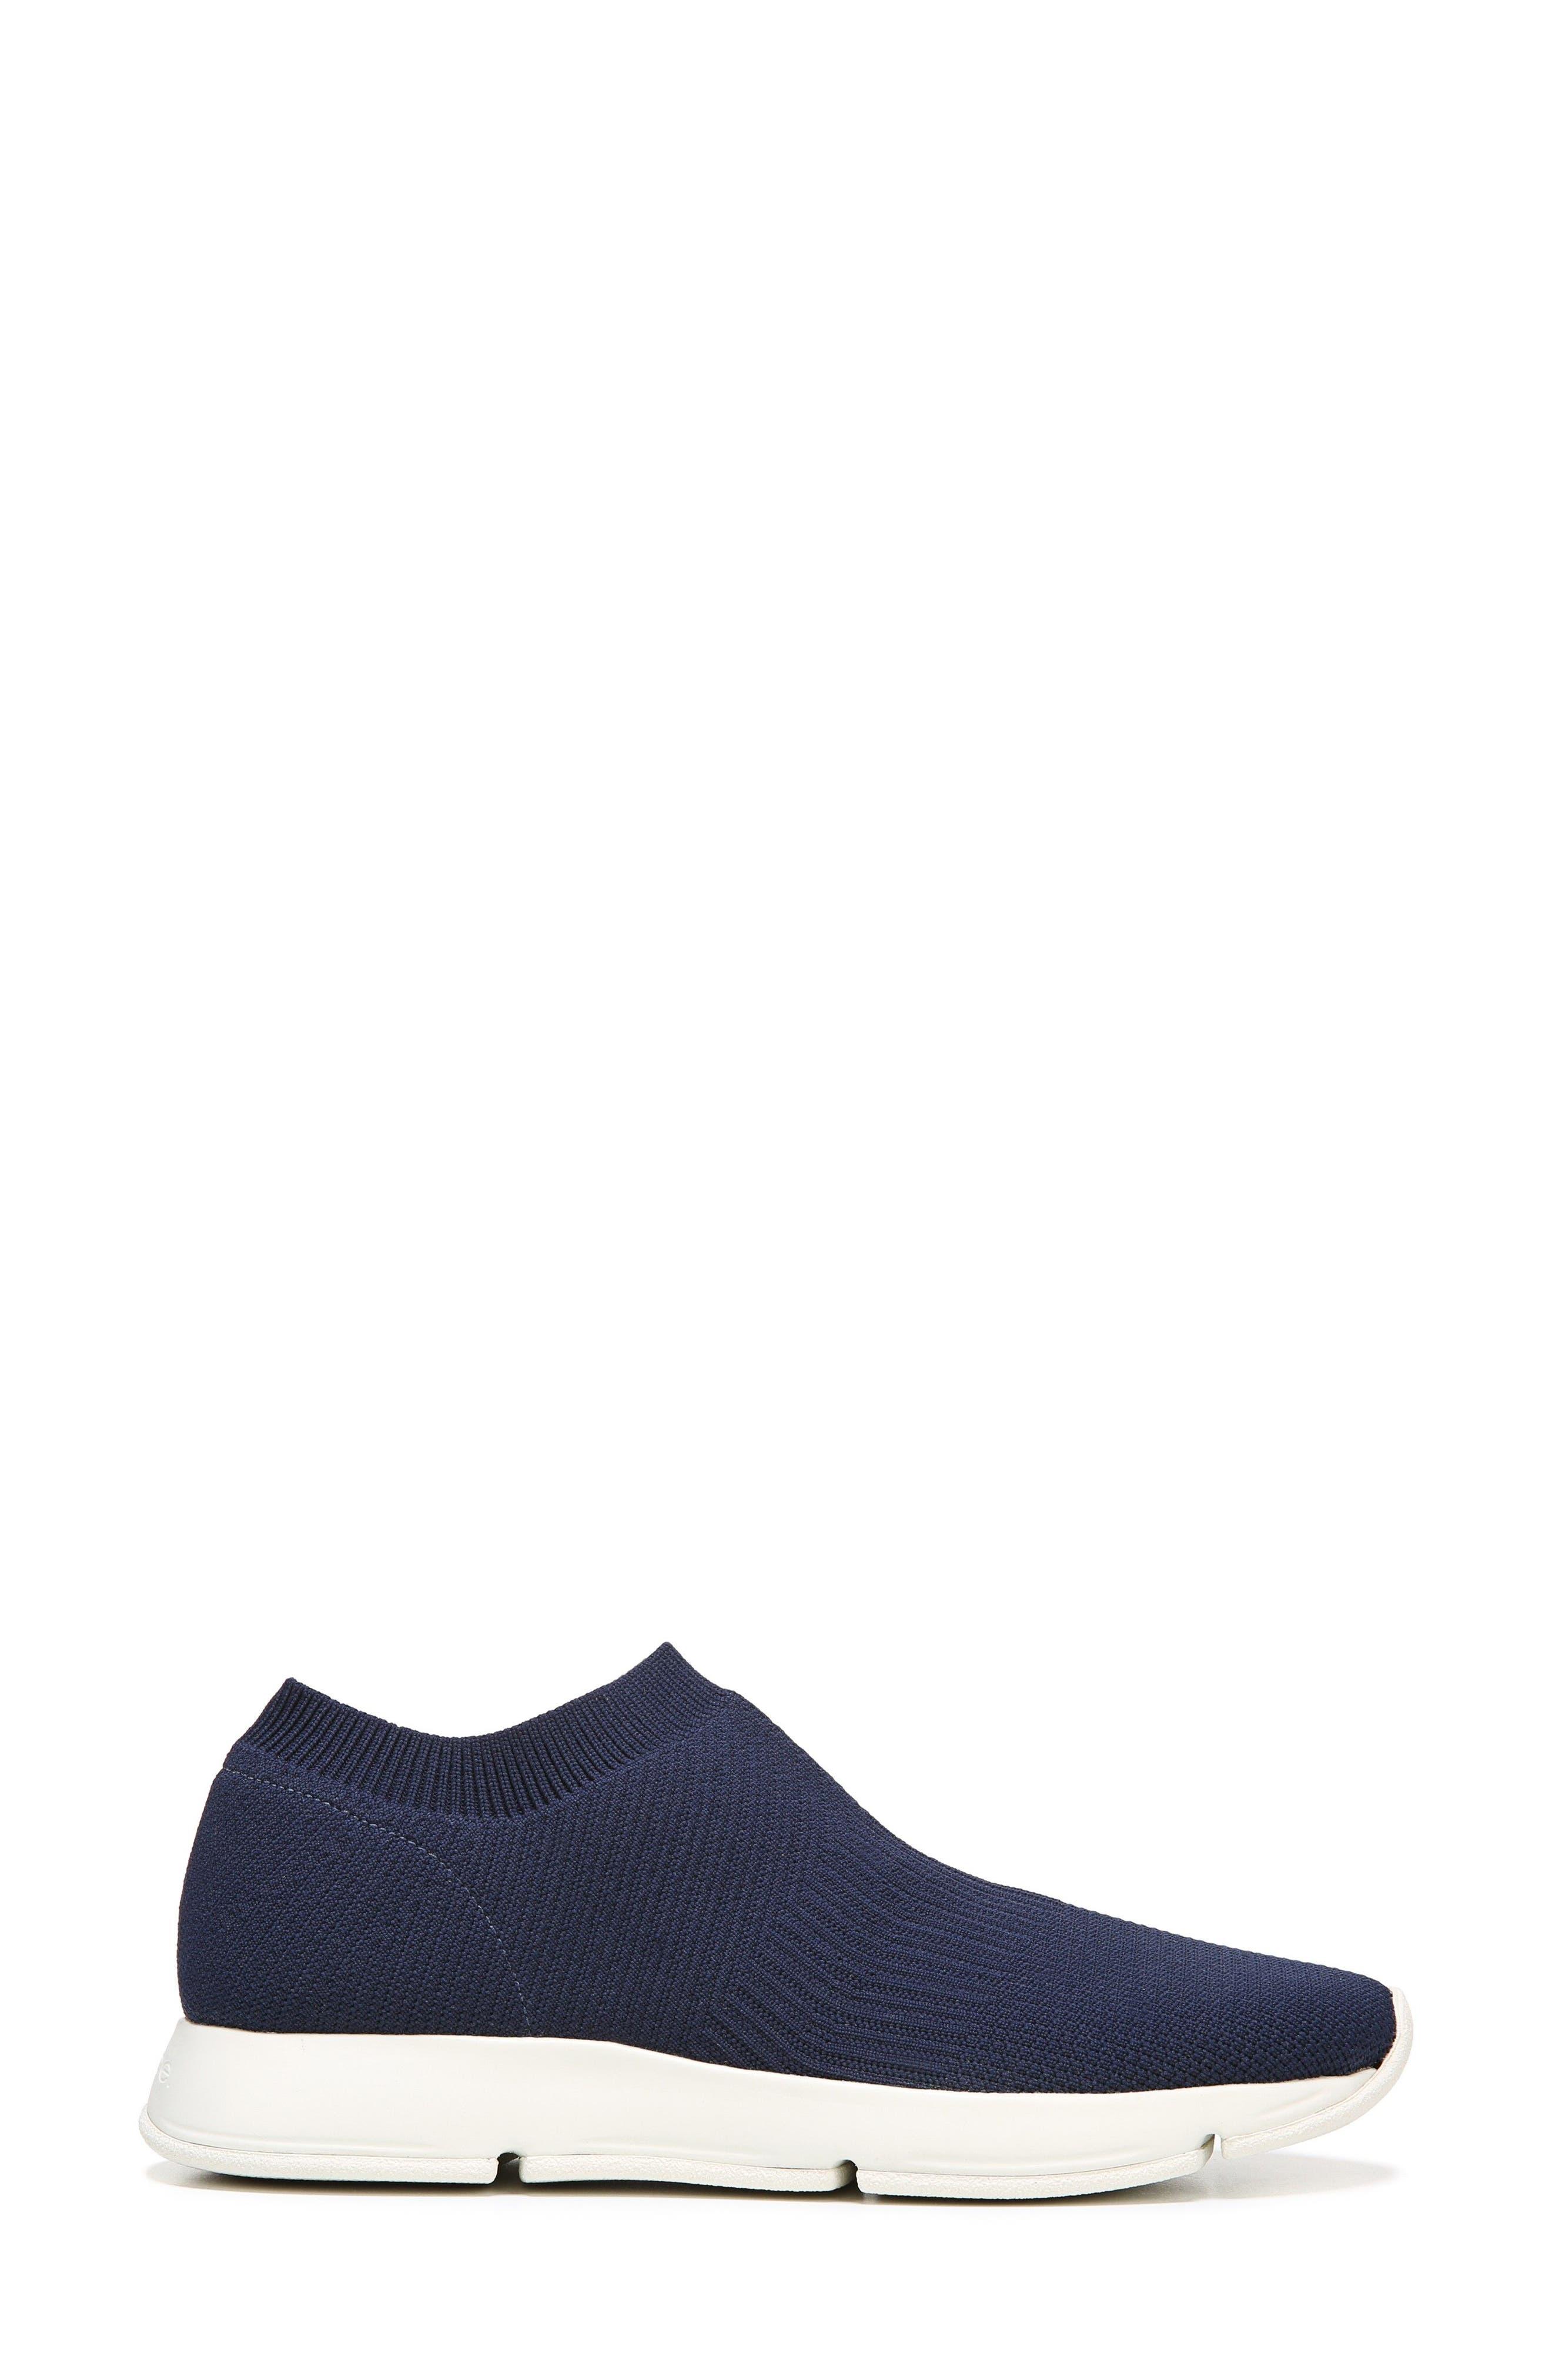 Theroux Slip-On Knit Sneaker,                             Alternate thumbnail 3, color,                             Navy